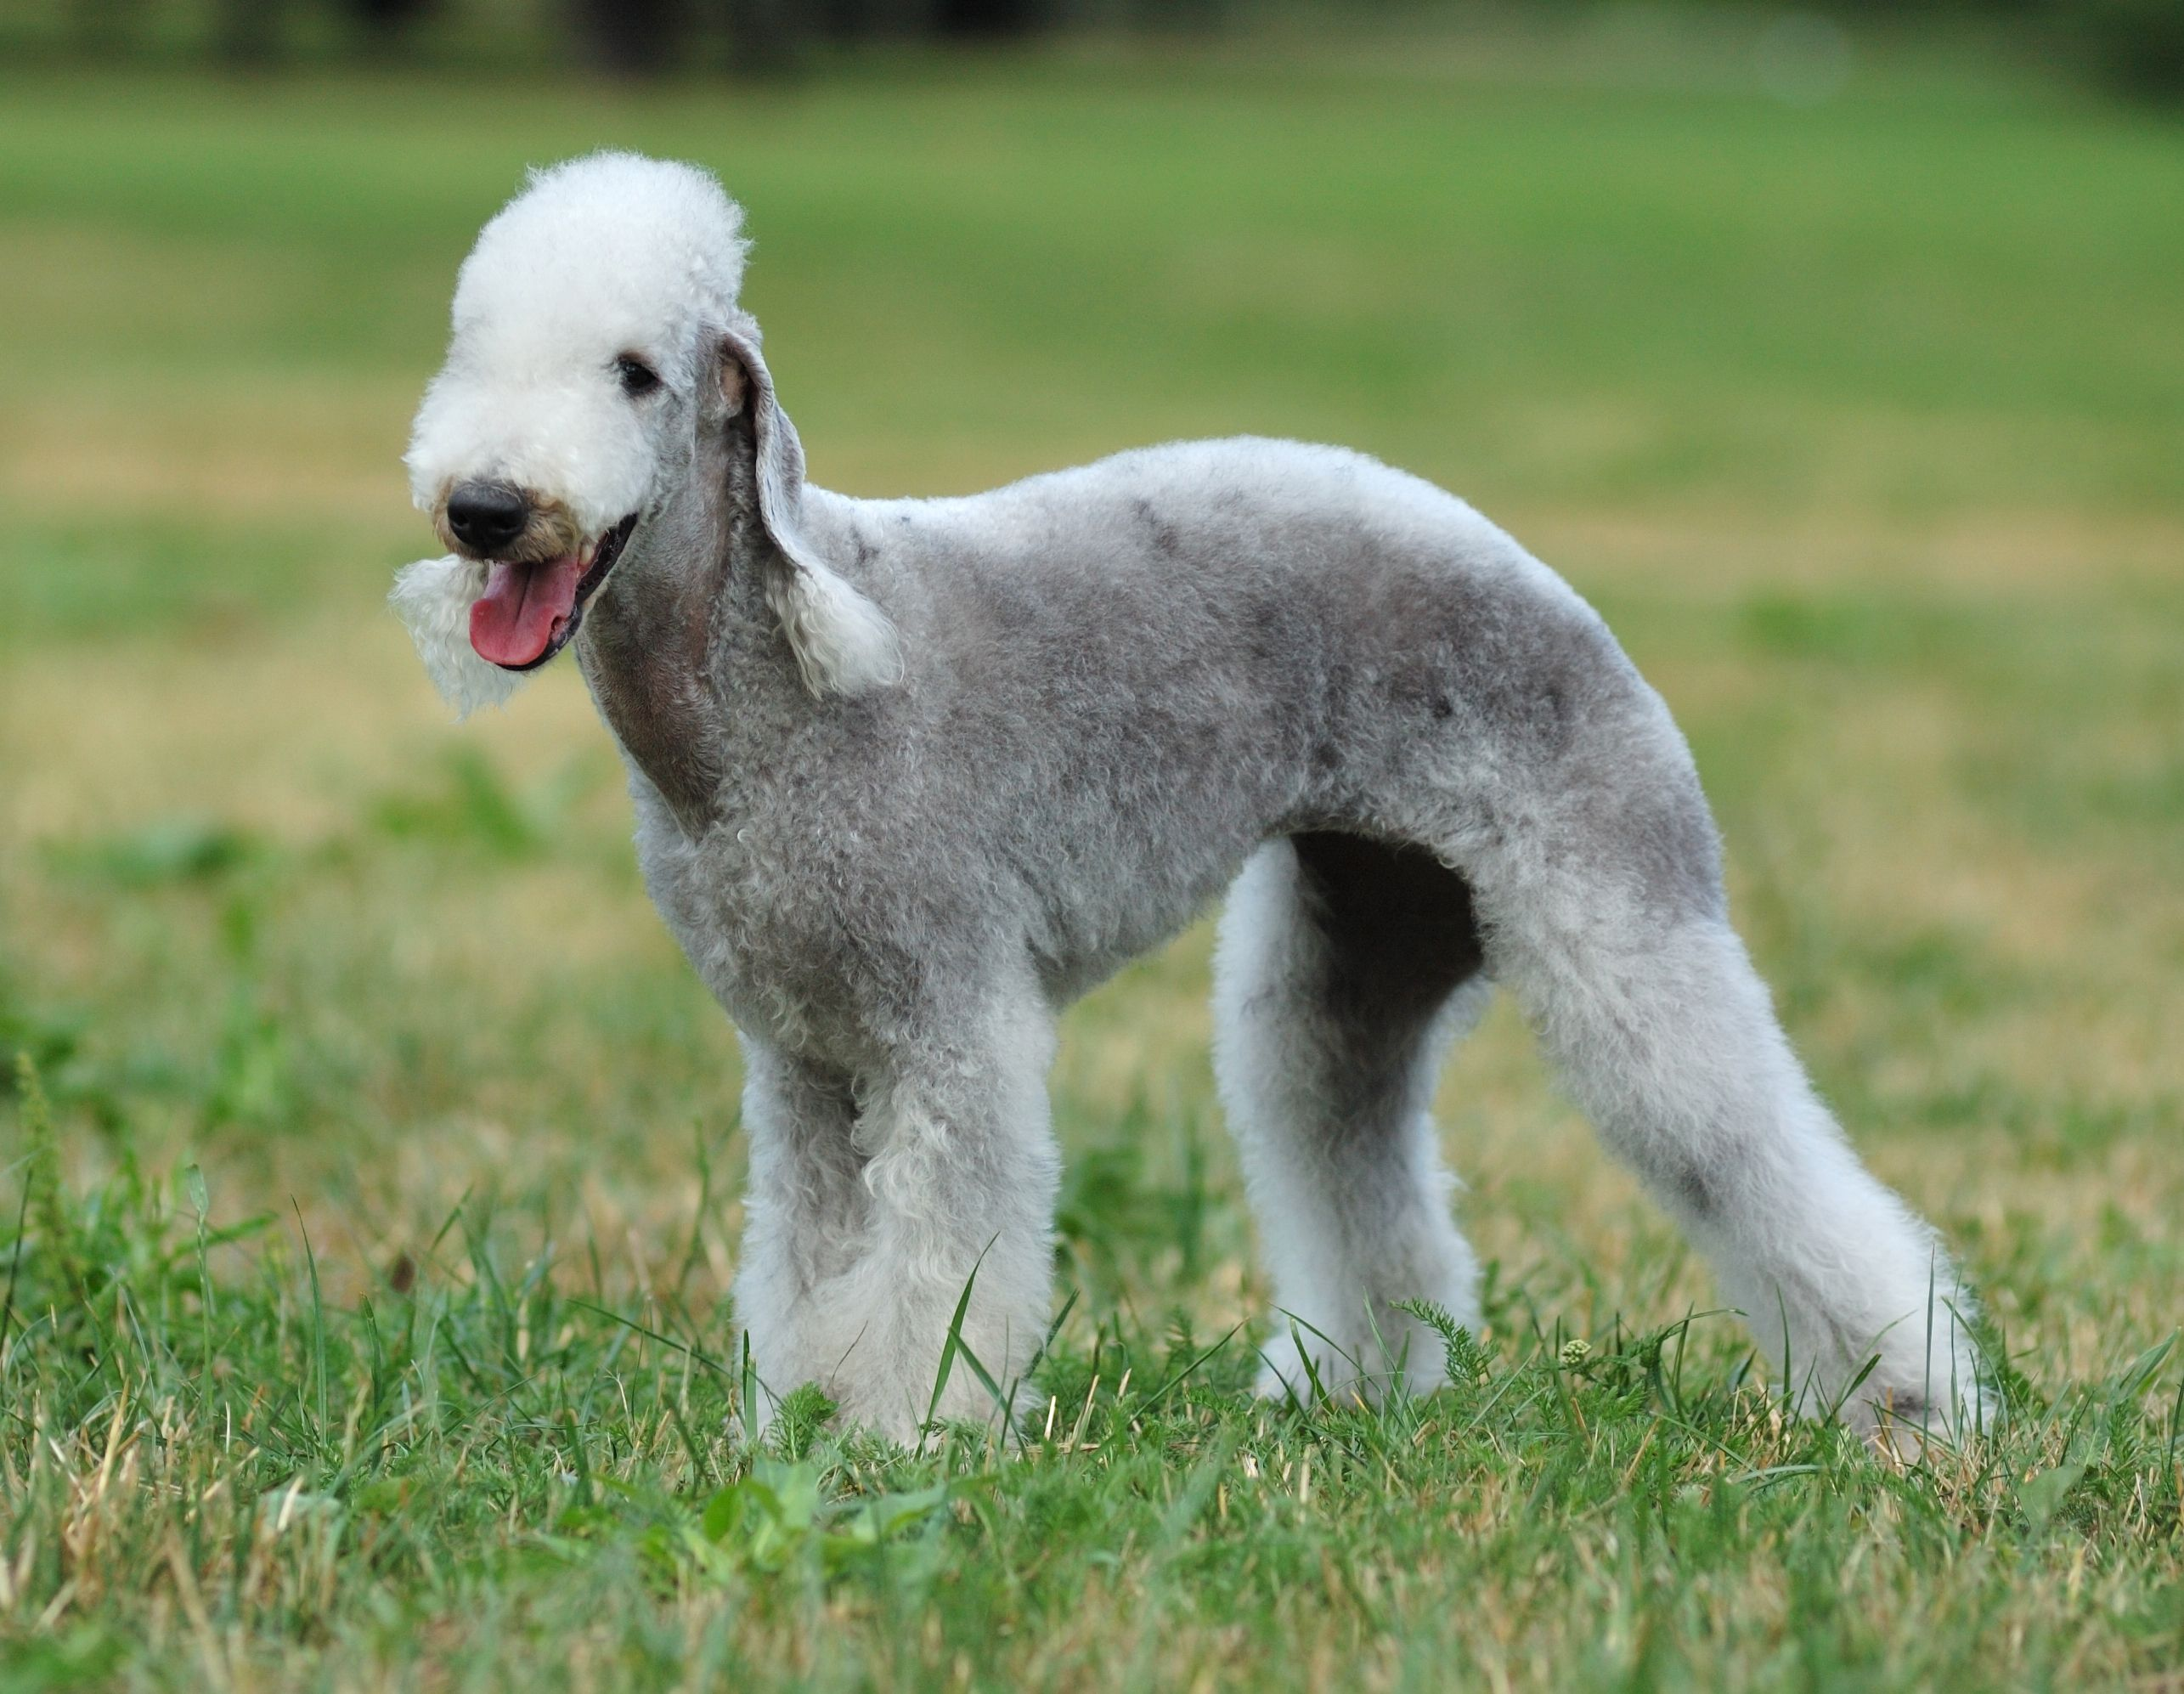 8. Bedlington Terrier